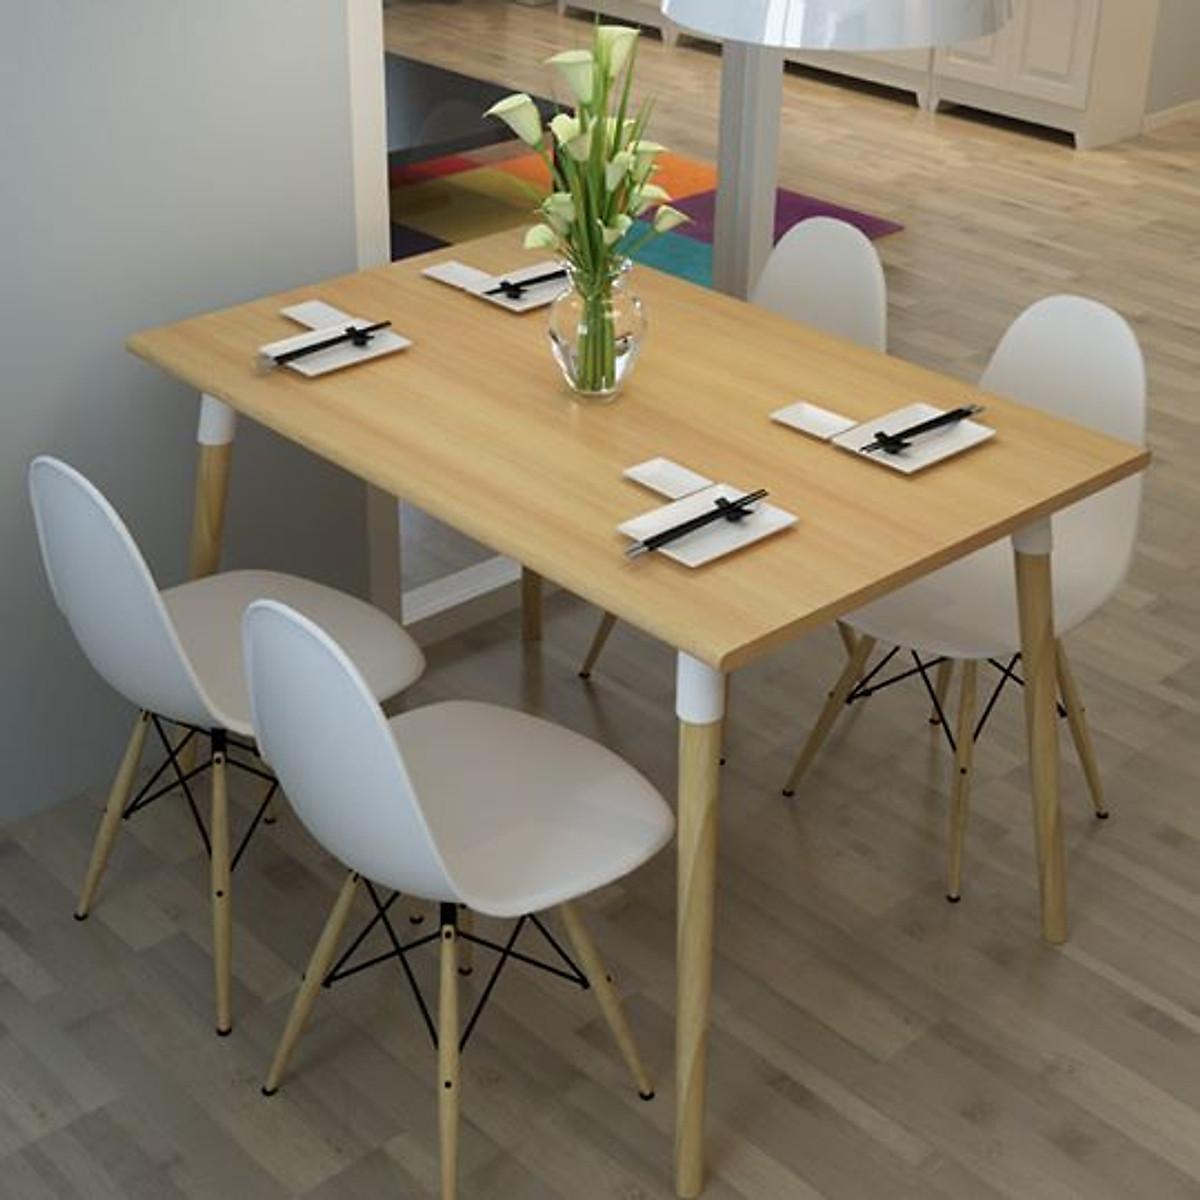 Bộ bàn ghế ăn tối giản kiểu Bắc Âu POANG